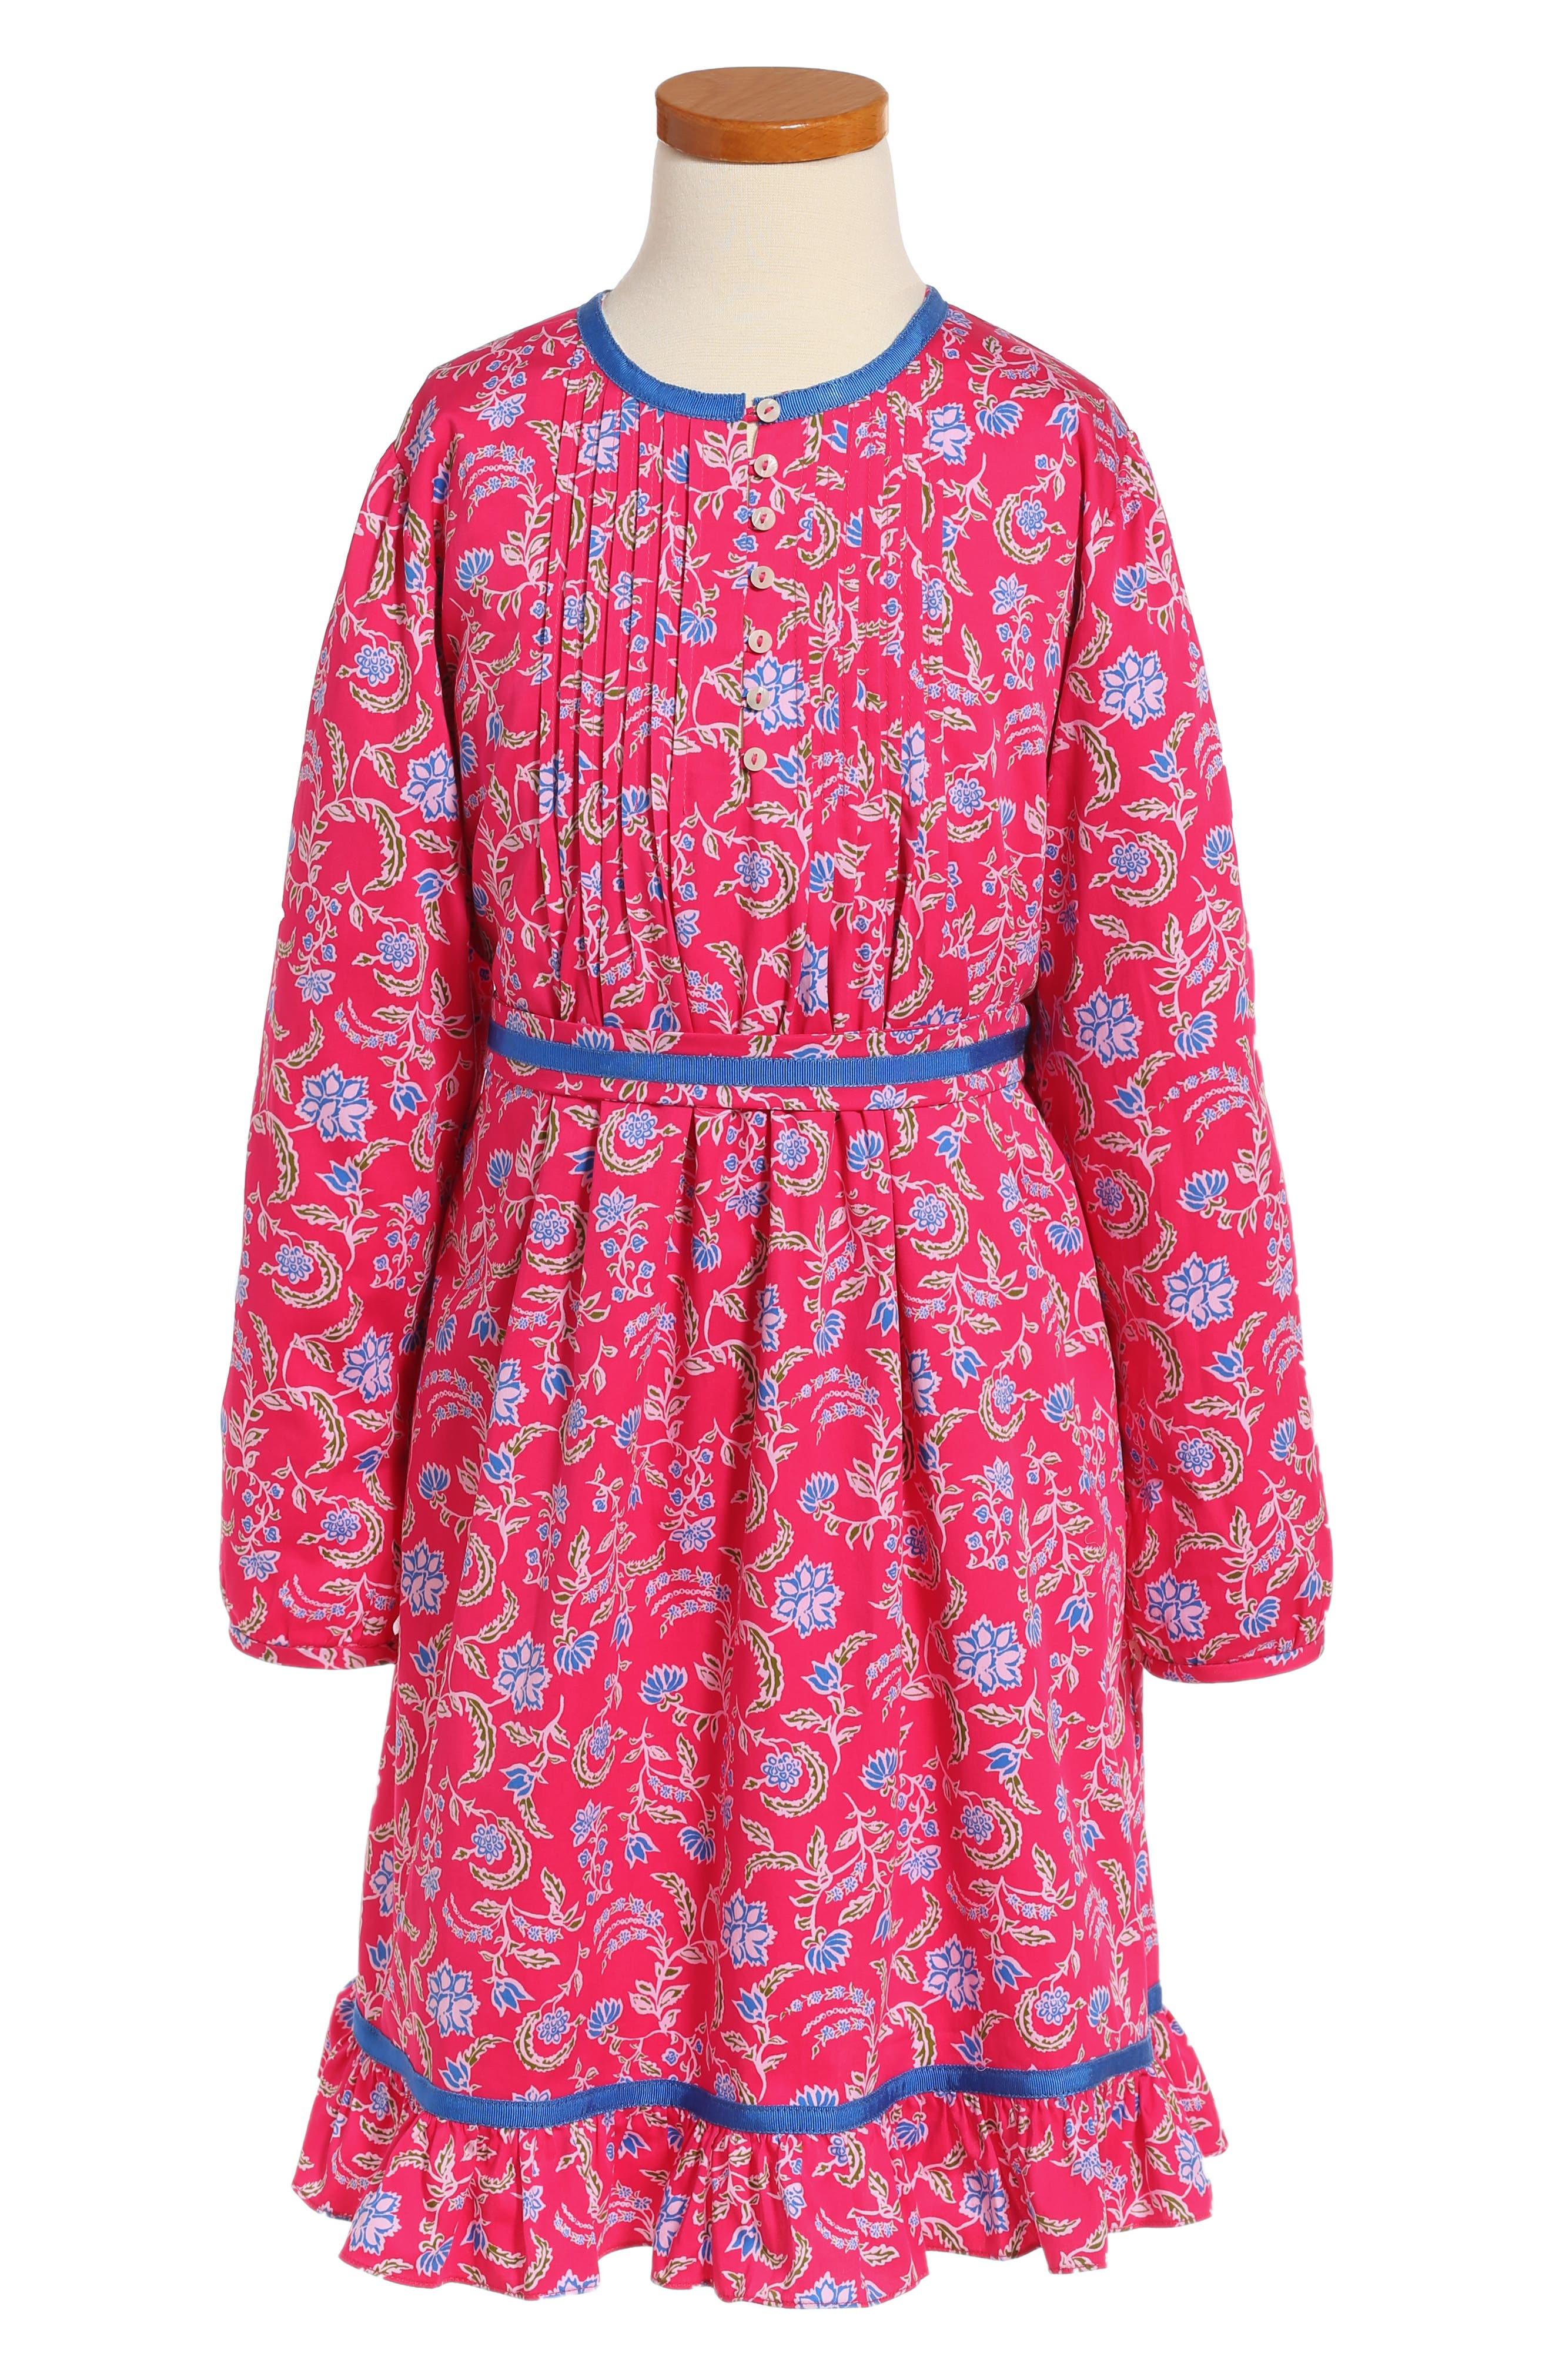 Lotus Flower Dress,                         Main,                         color, 696